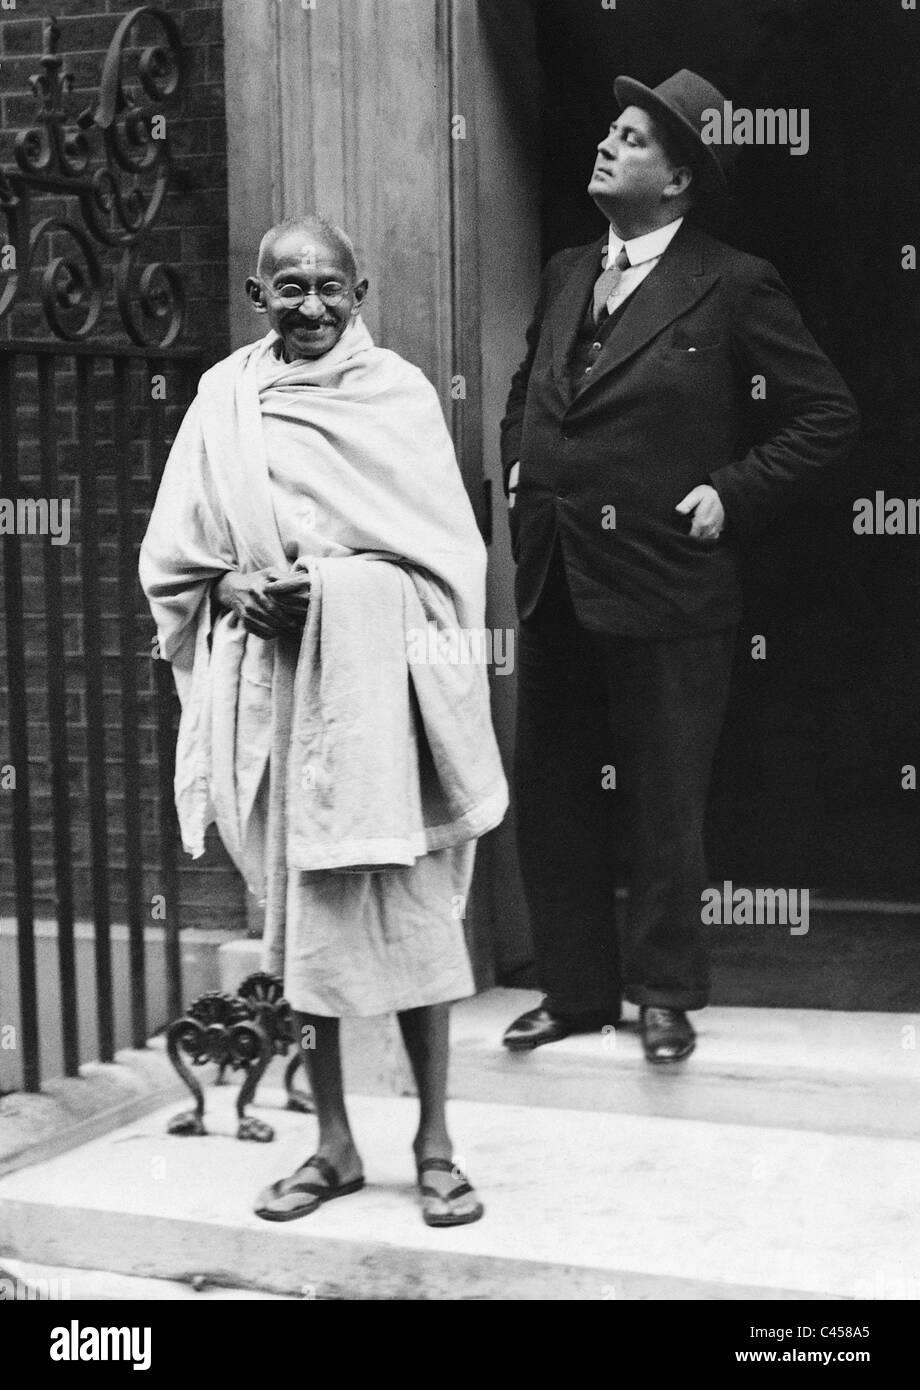 Il Mahatma Gandhi di fronte 10 Downing Street, 1931 Immagini Stock